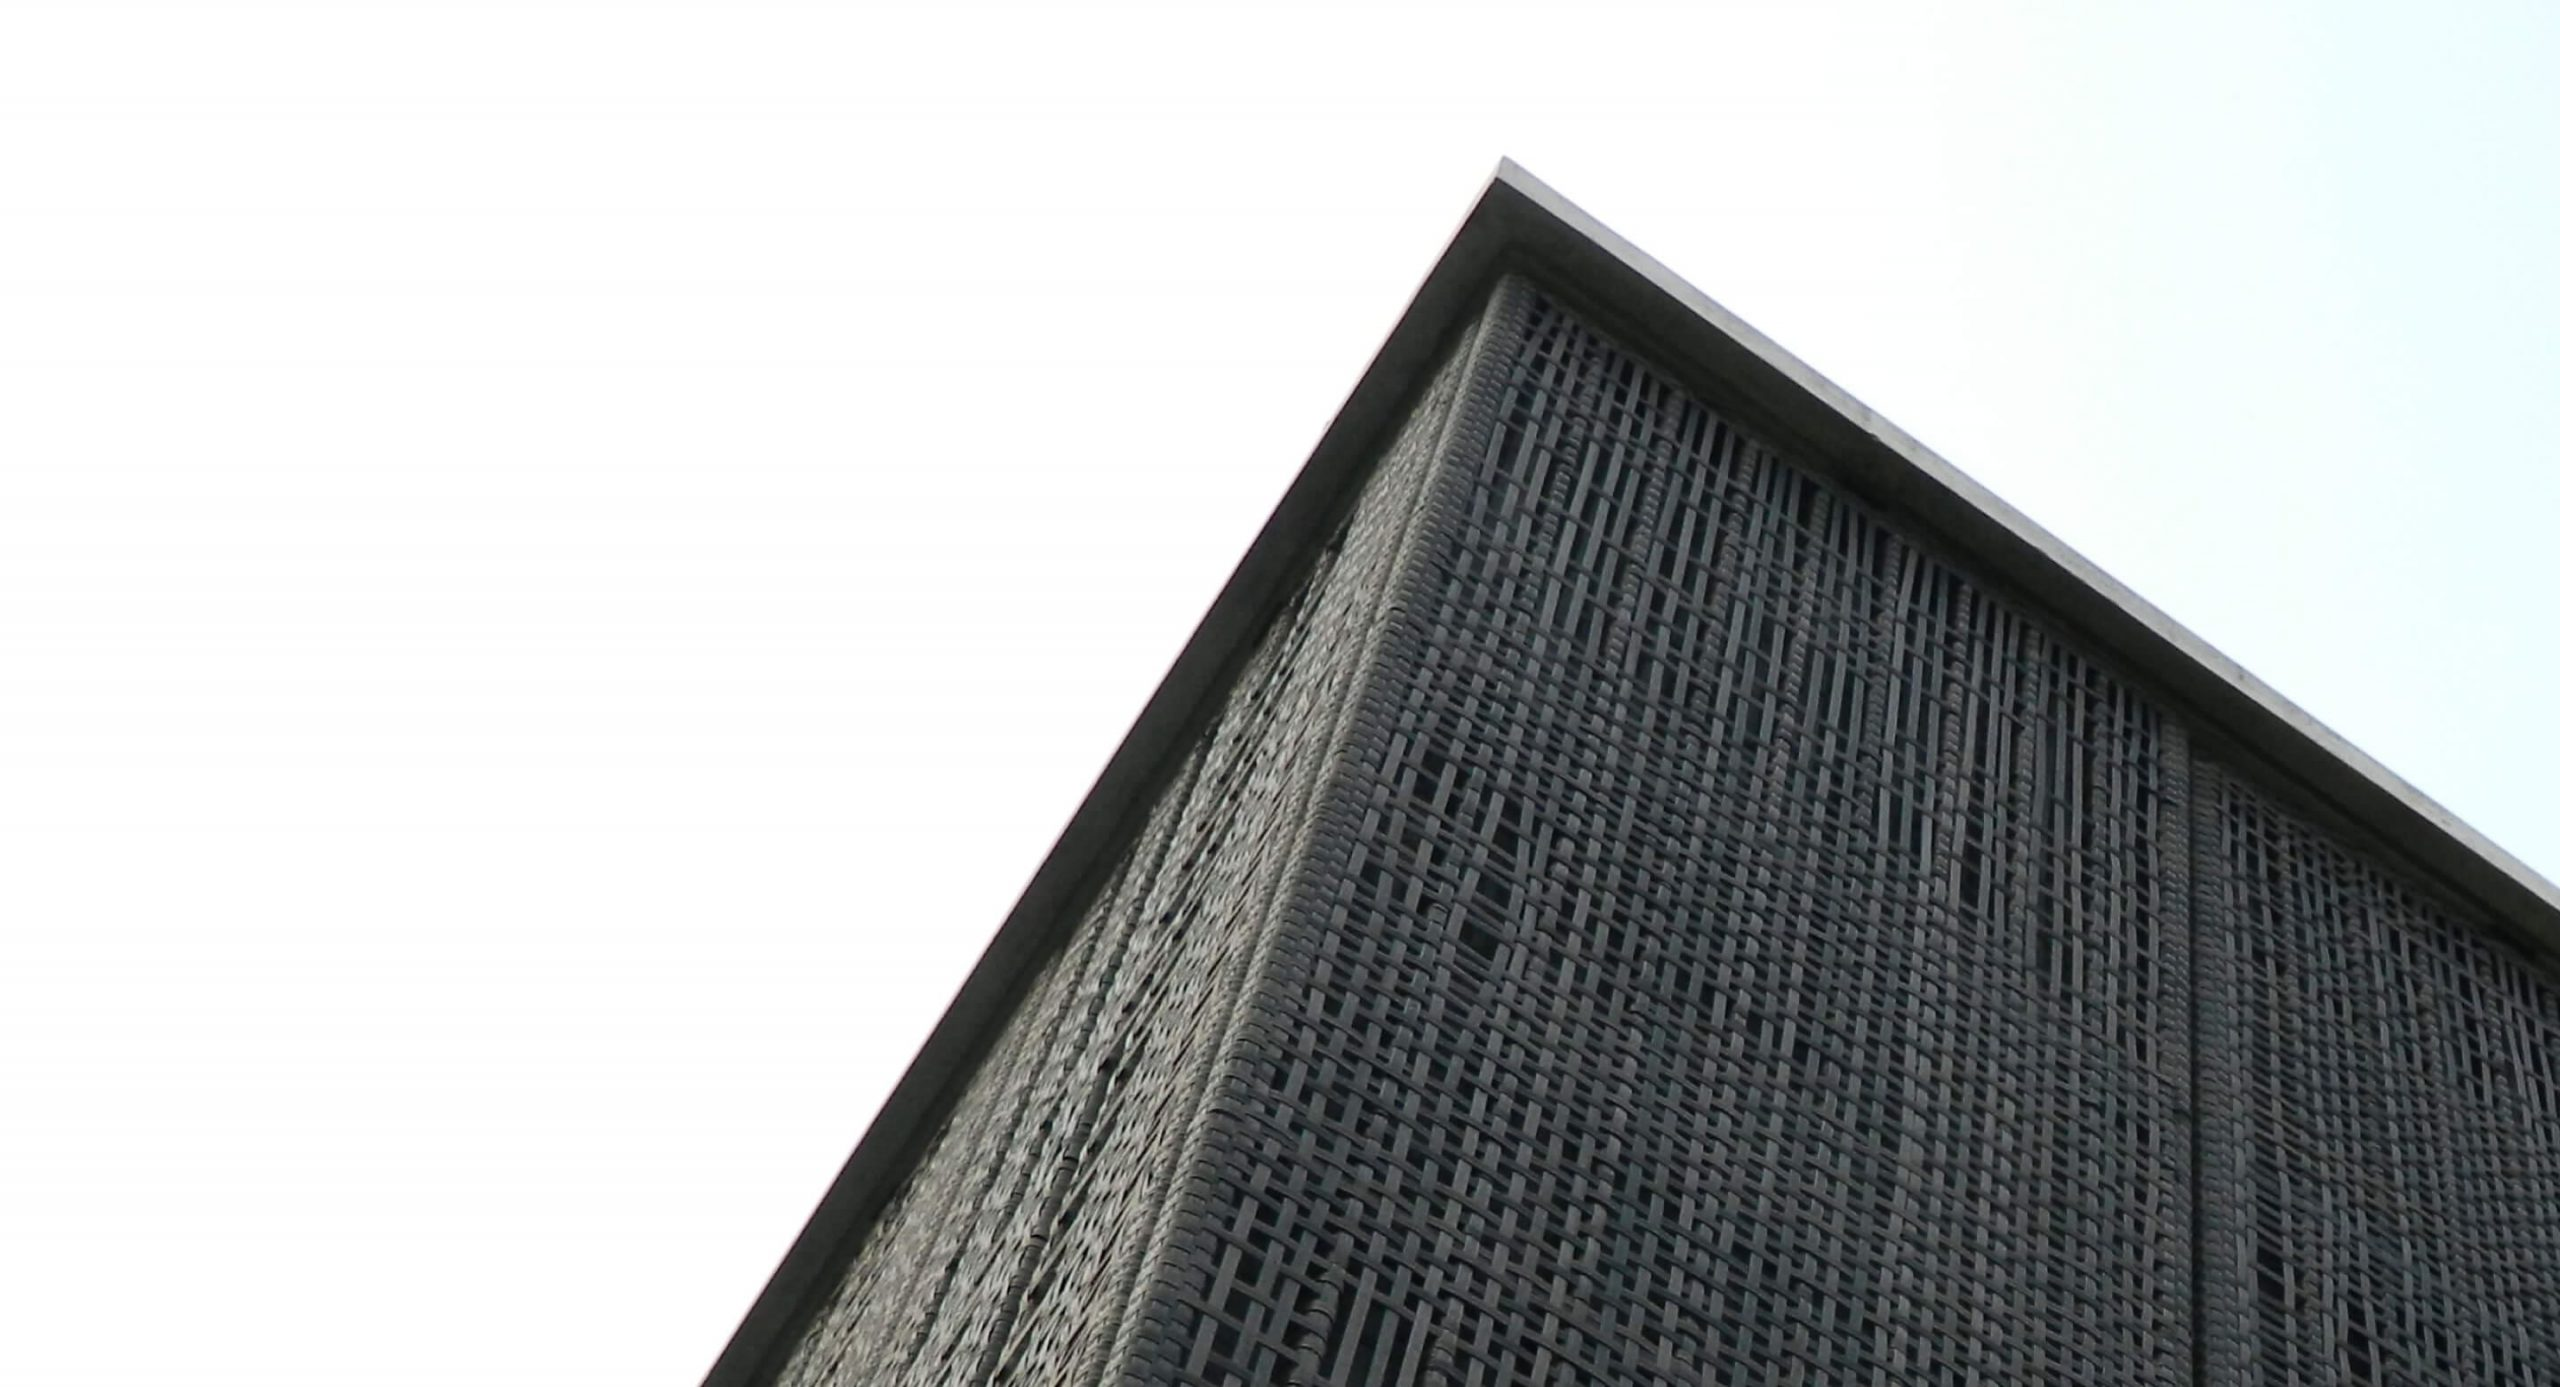 bangka house (2012)